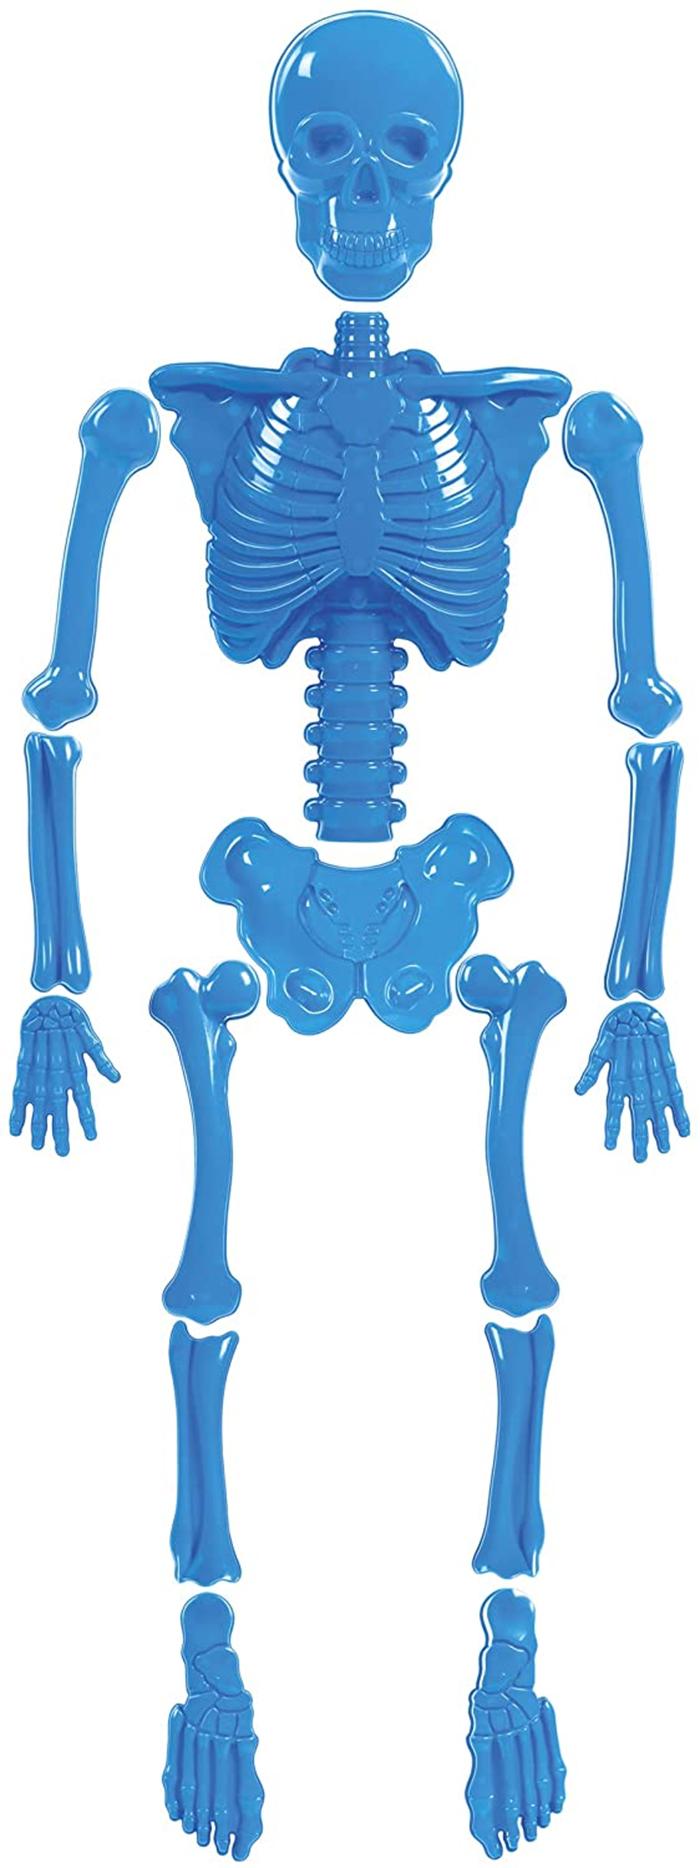 bag o bones beach skeleton sand mold toys